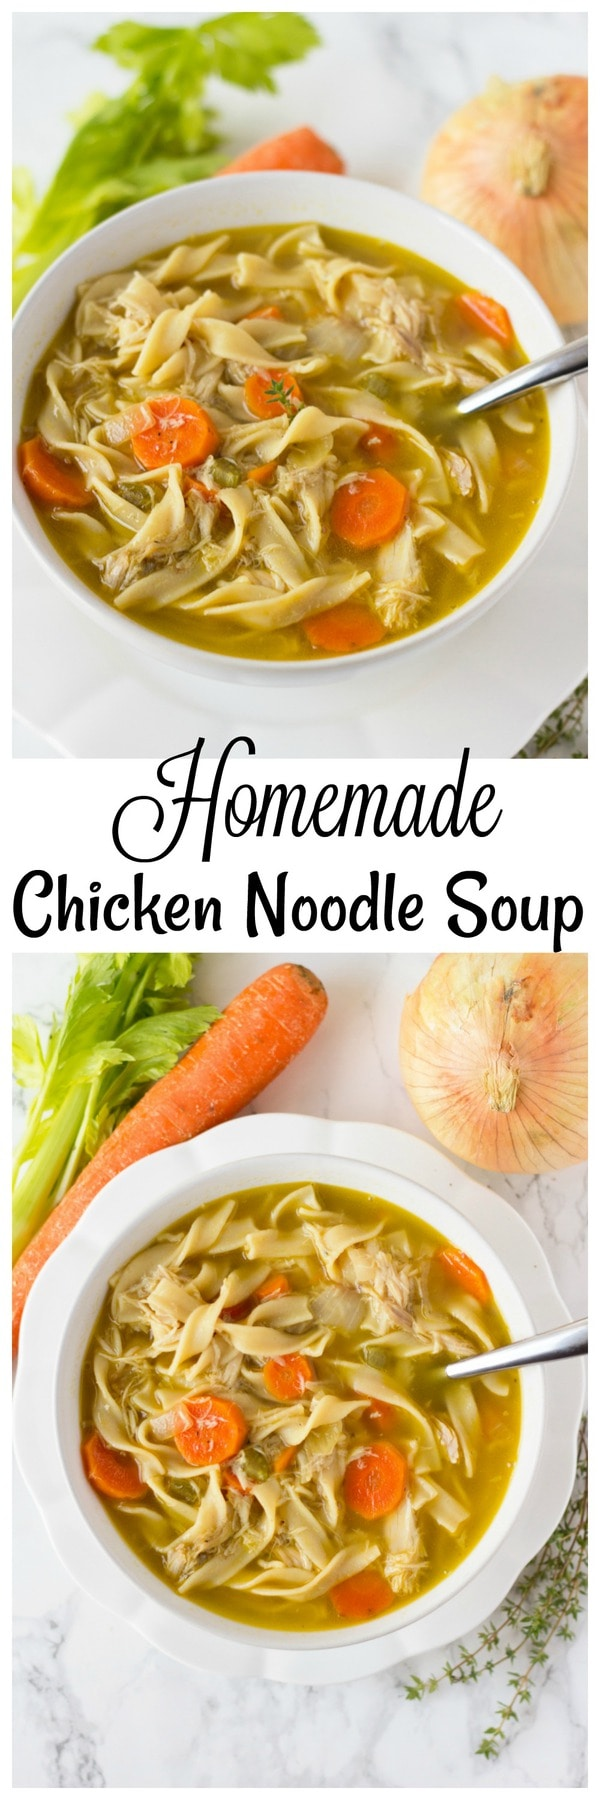 Homemade Chicken Noodle Soup Homemade Soup Recipe